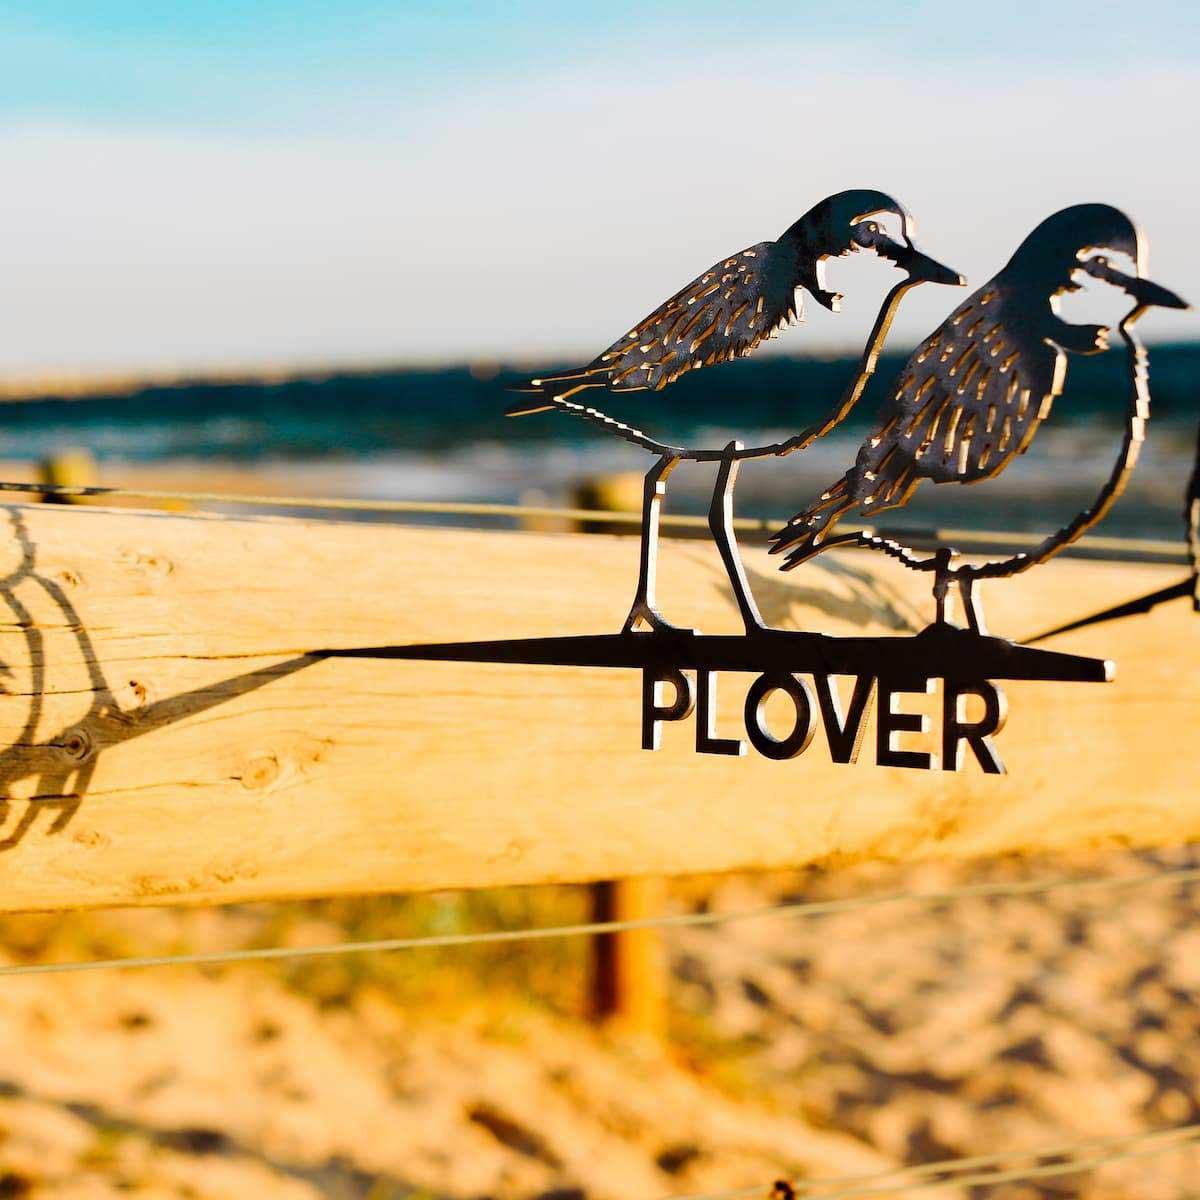 Plover Metalbird Corten Bird Silhouettes   The Design Gift Shop